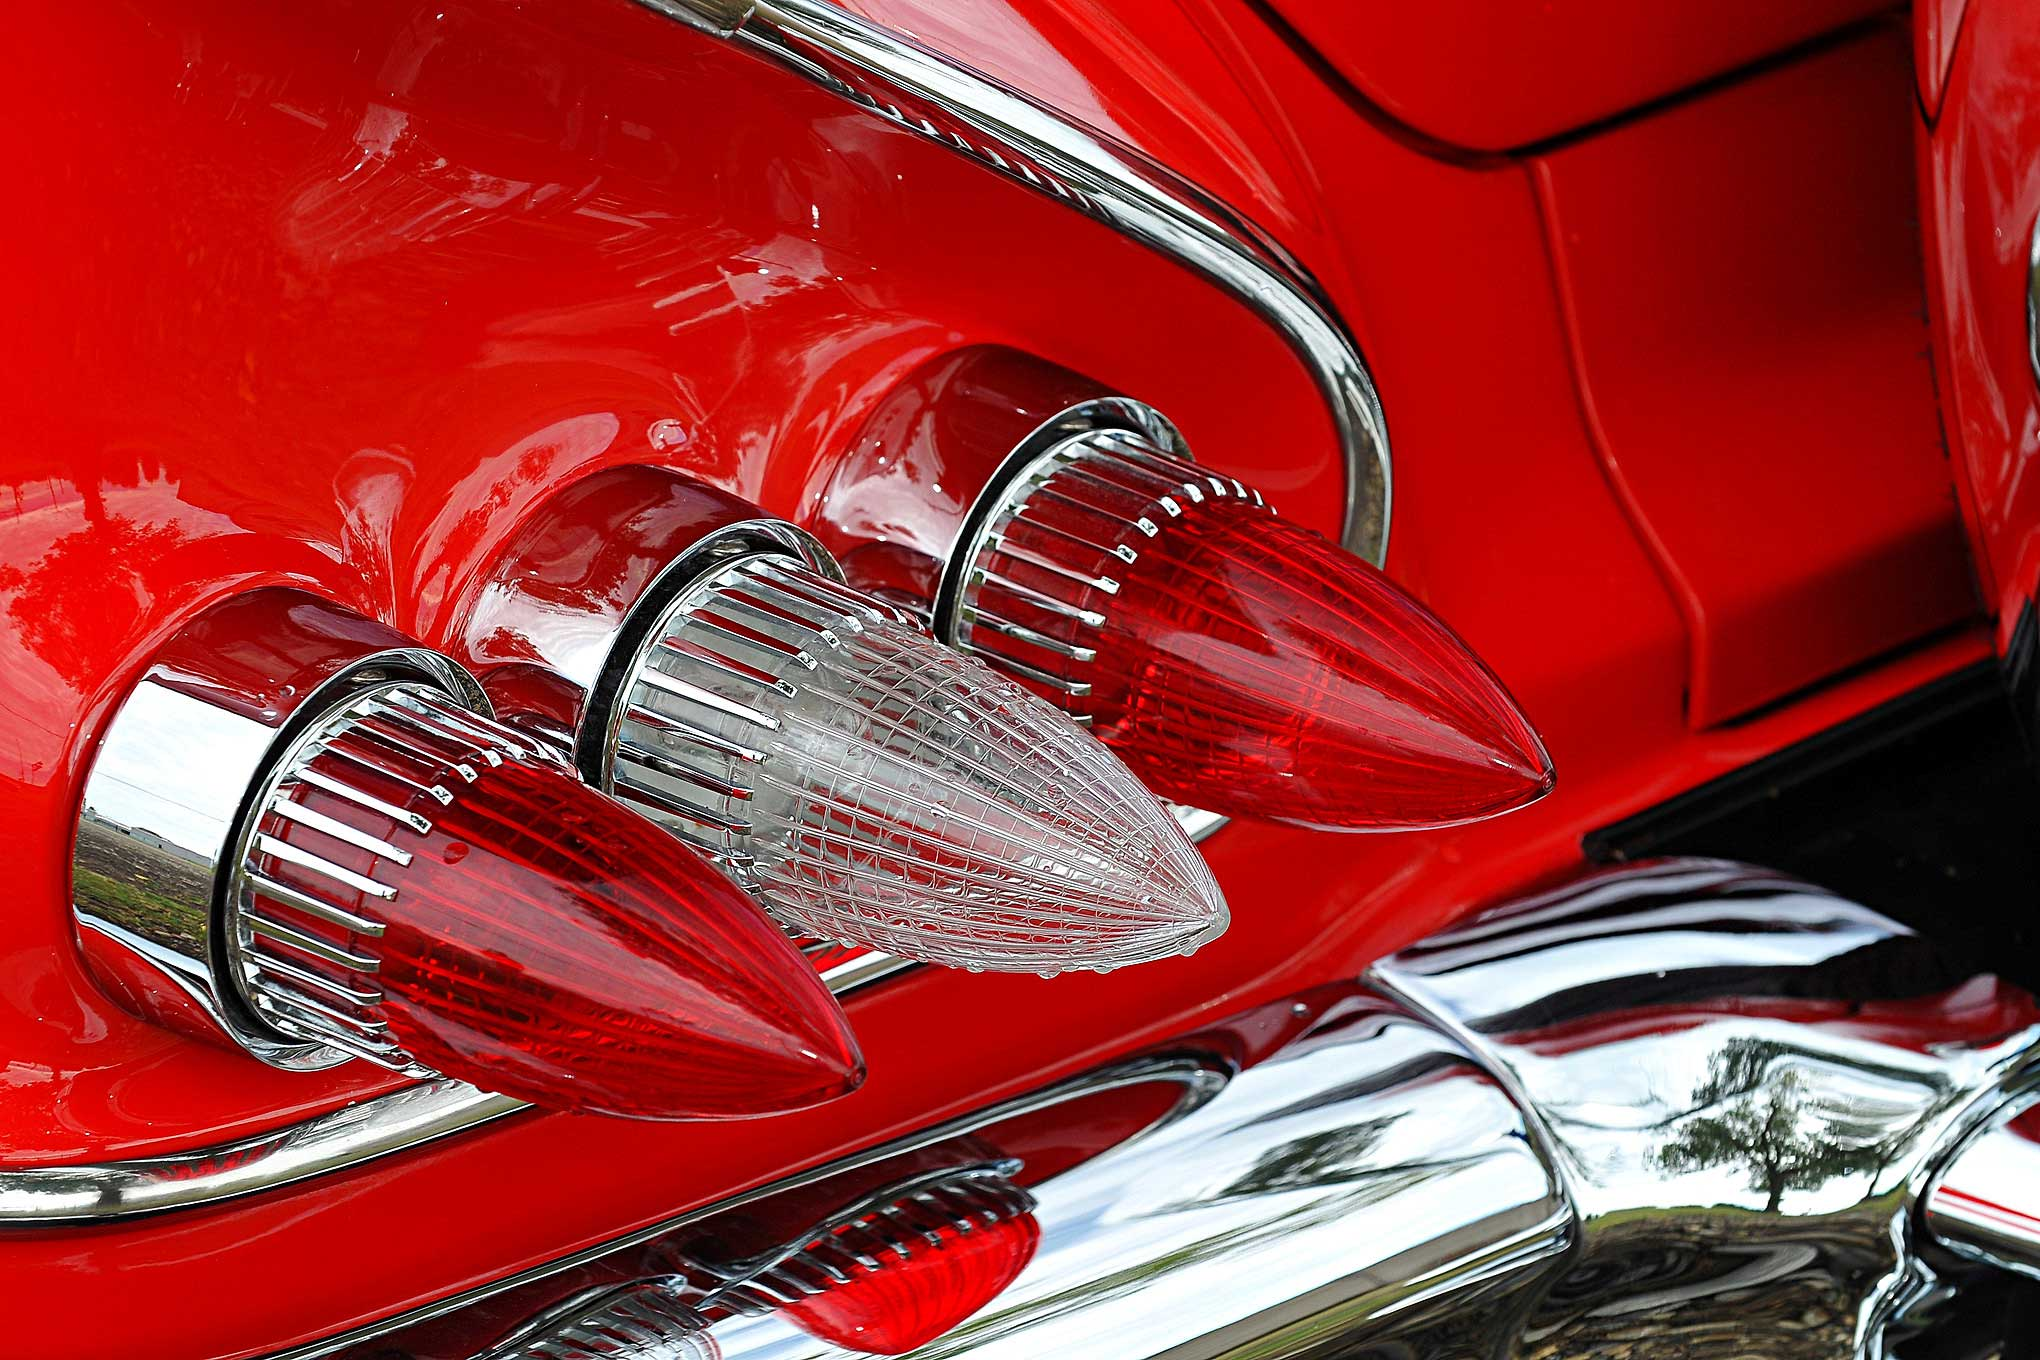 1958 chevy tail light wiring 1958 chevrolet impala movin  on up  1958 chevrolet impala movin  on up